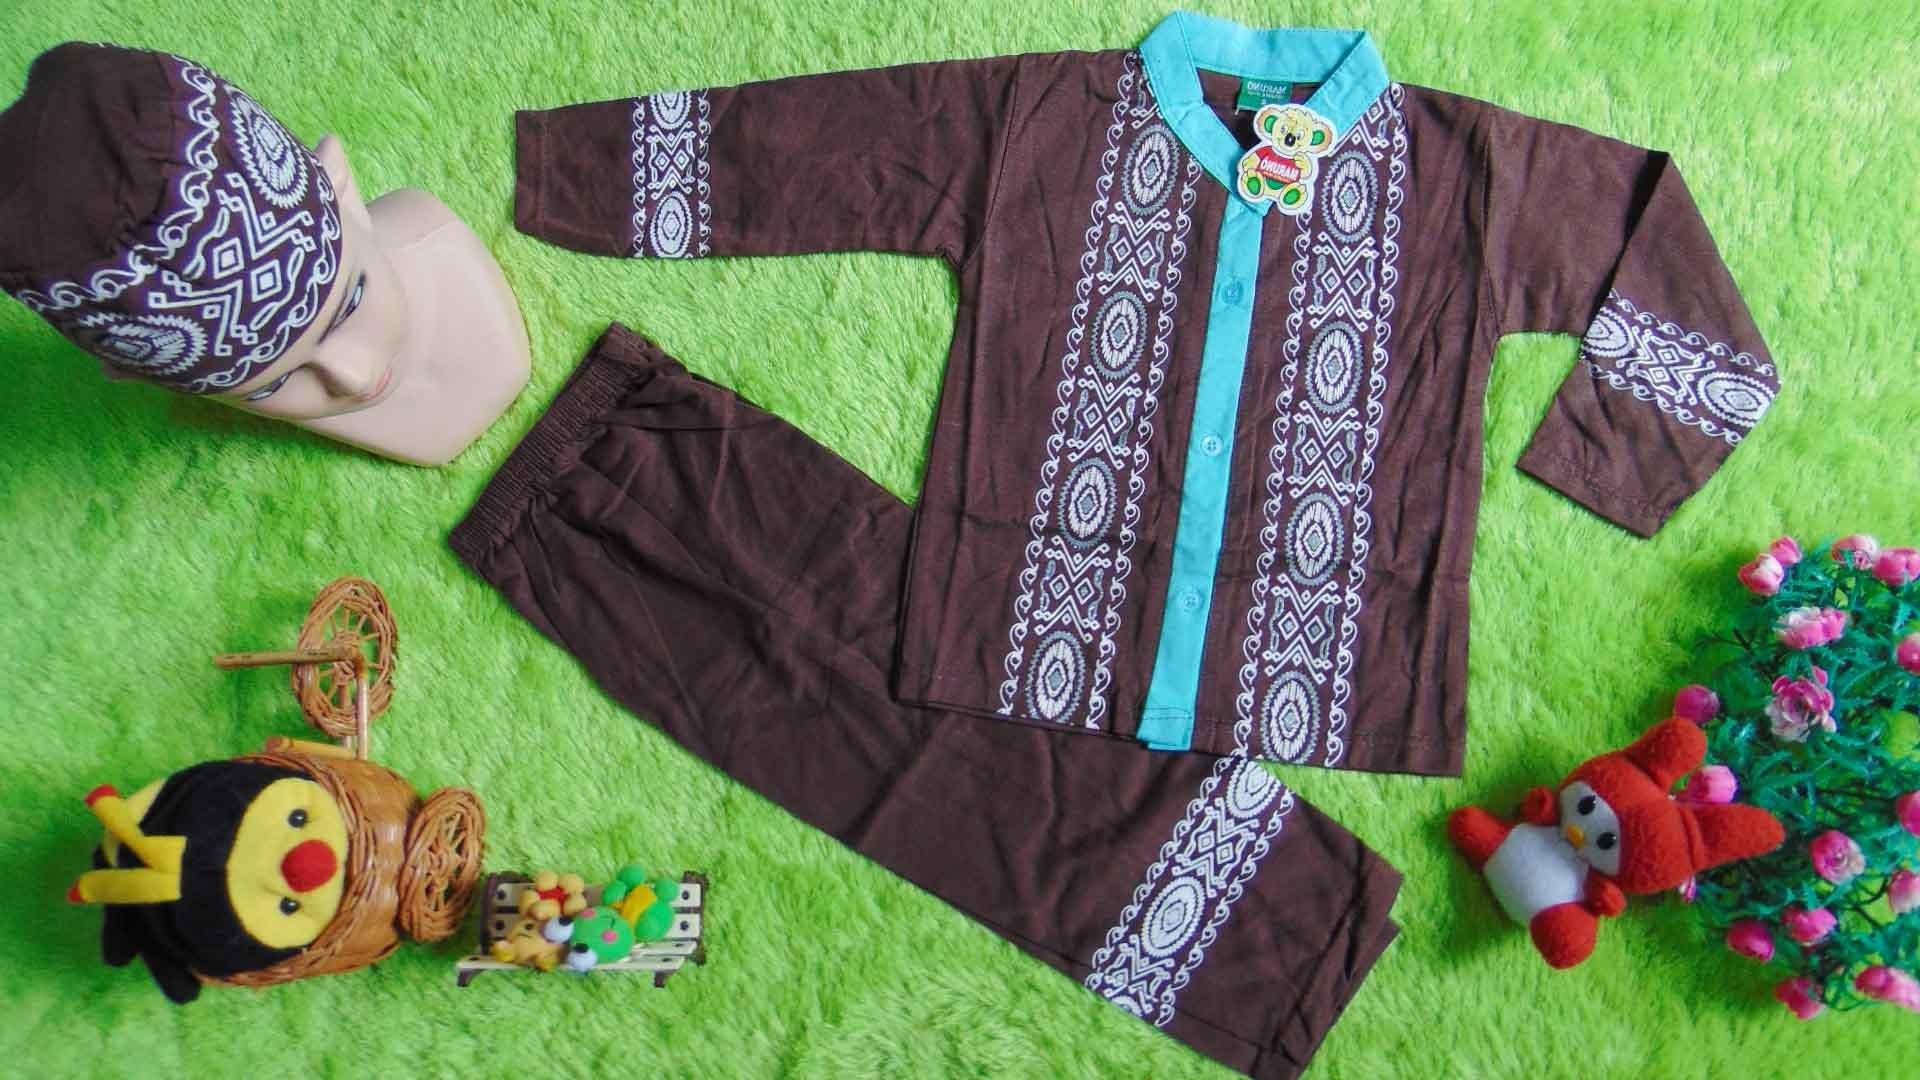 Design Baju Lebaran Laki Laki T8dj Paling Laris Setelan Baju Koko Muslim Lebaran Ramadhan